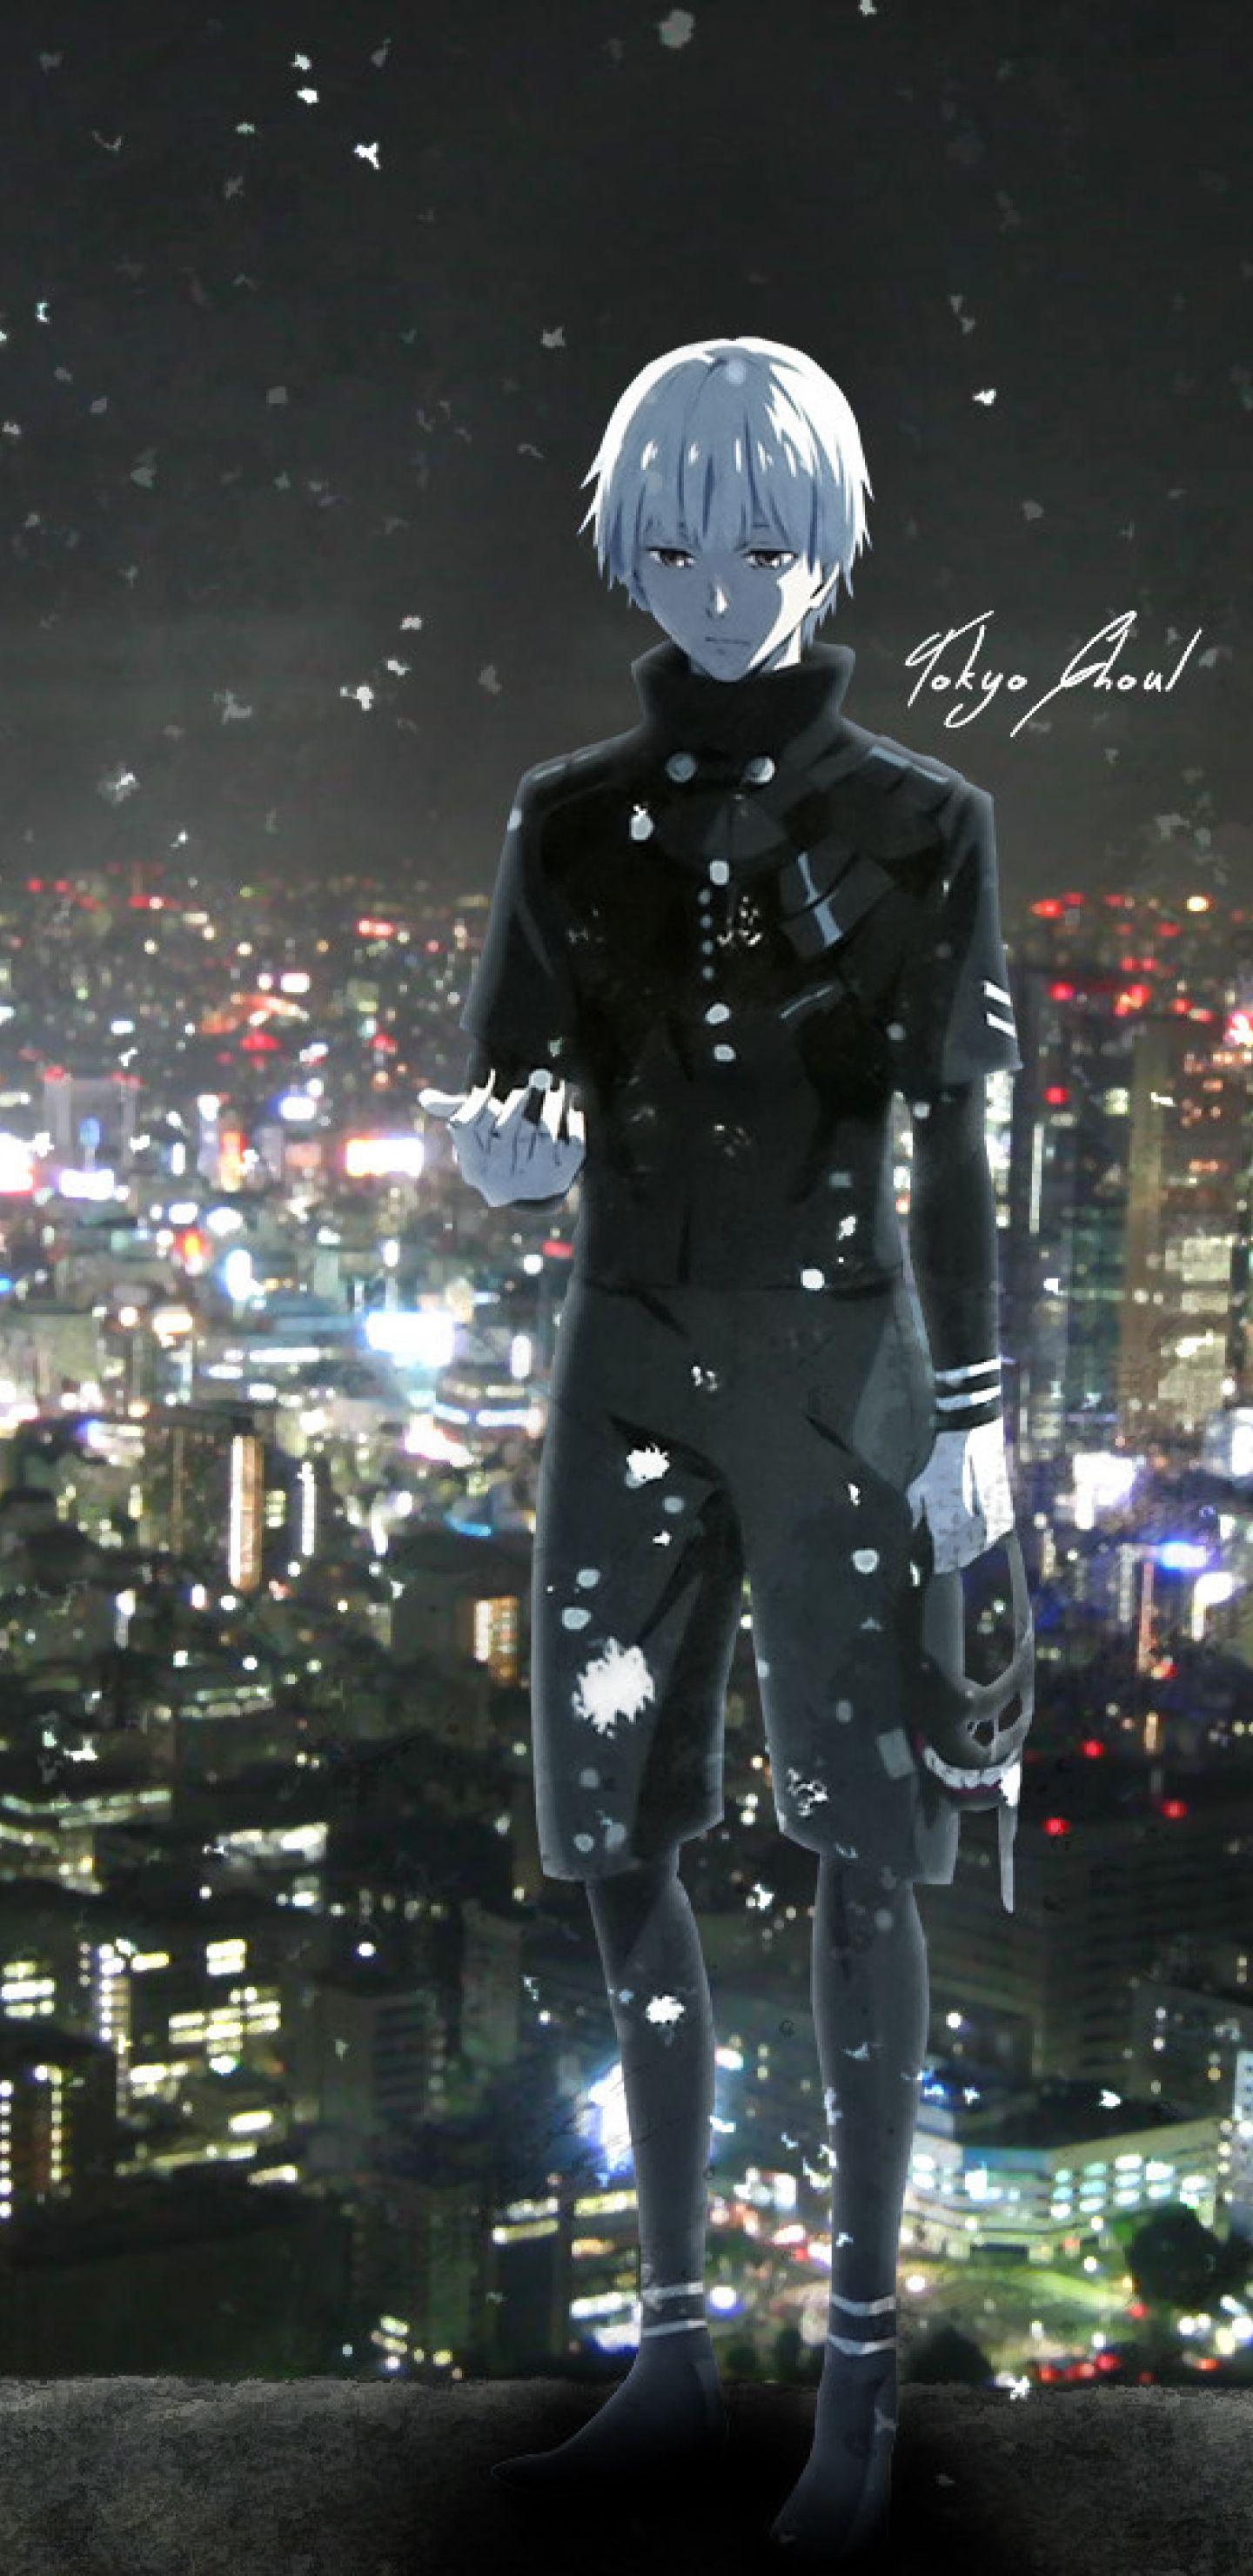 Pin On Hd Anime Wallpaper